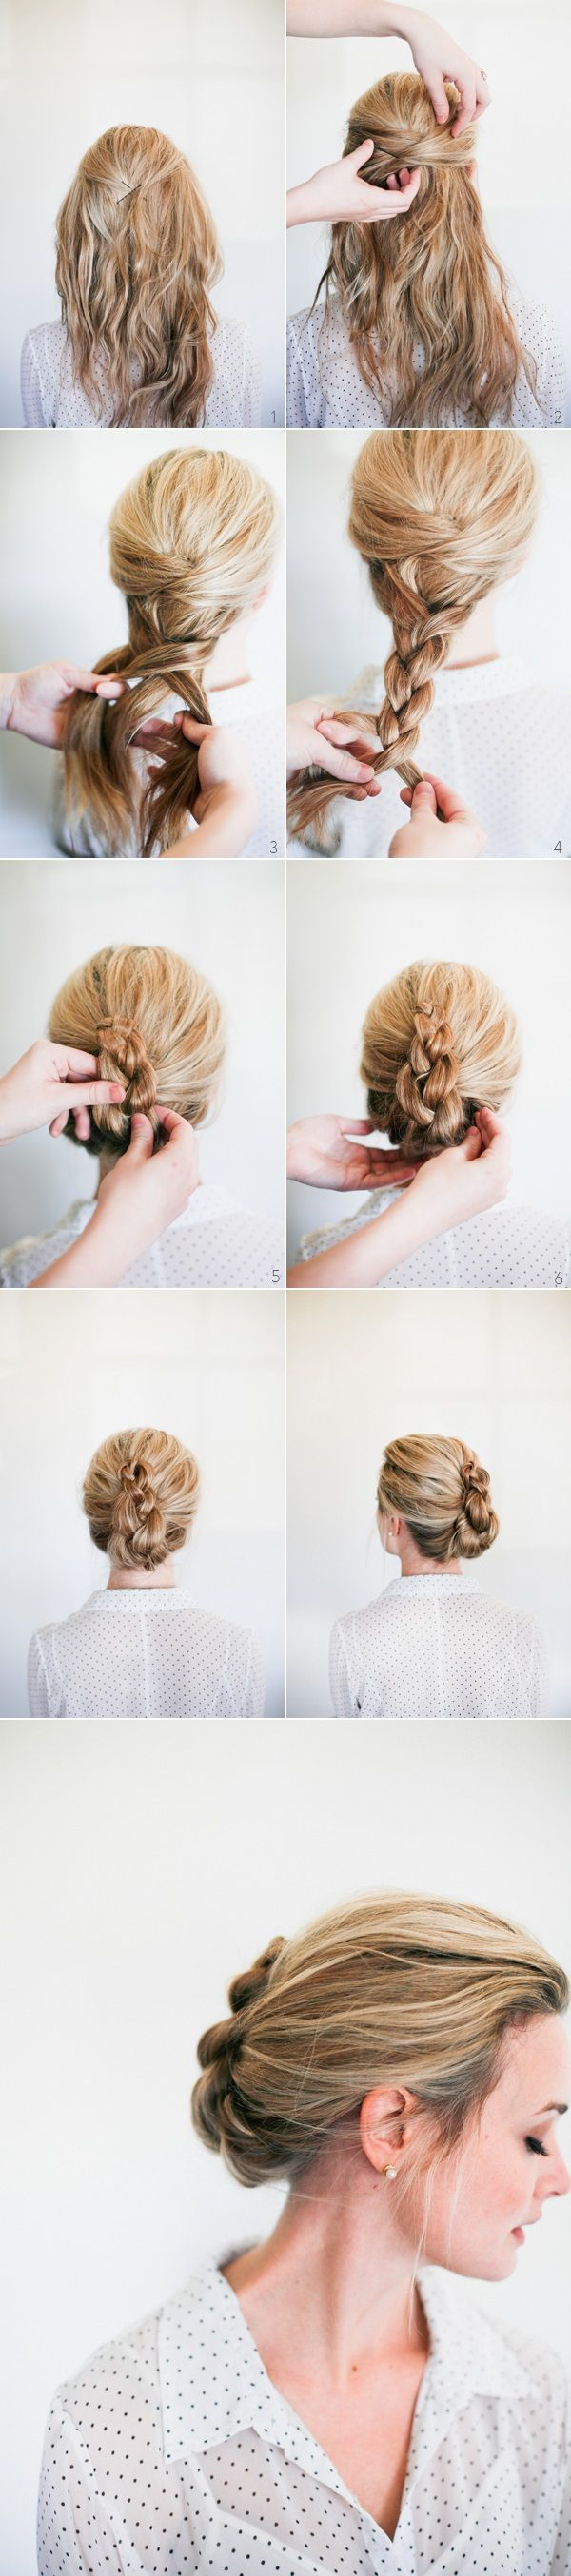 Wedding Hairstyle Tutorial: Romantic Braided French Twist | Wedding ...